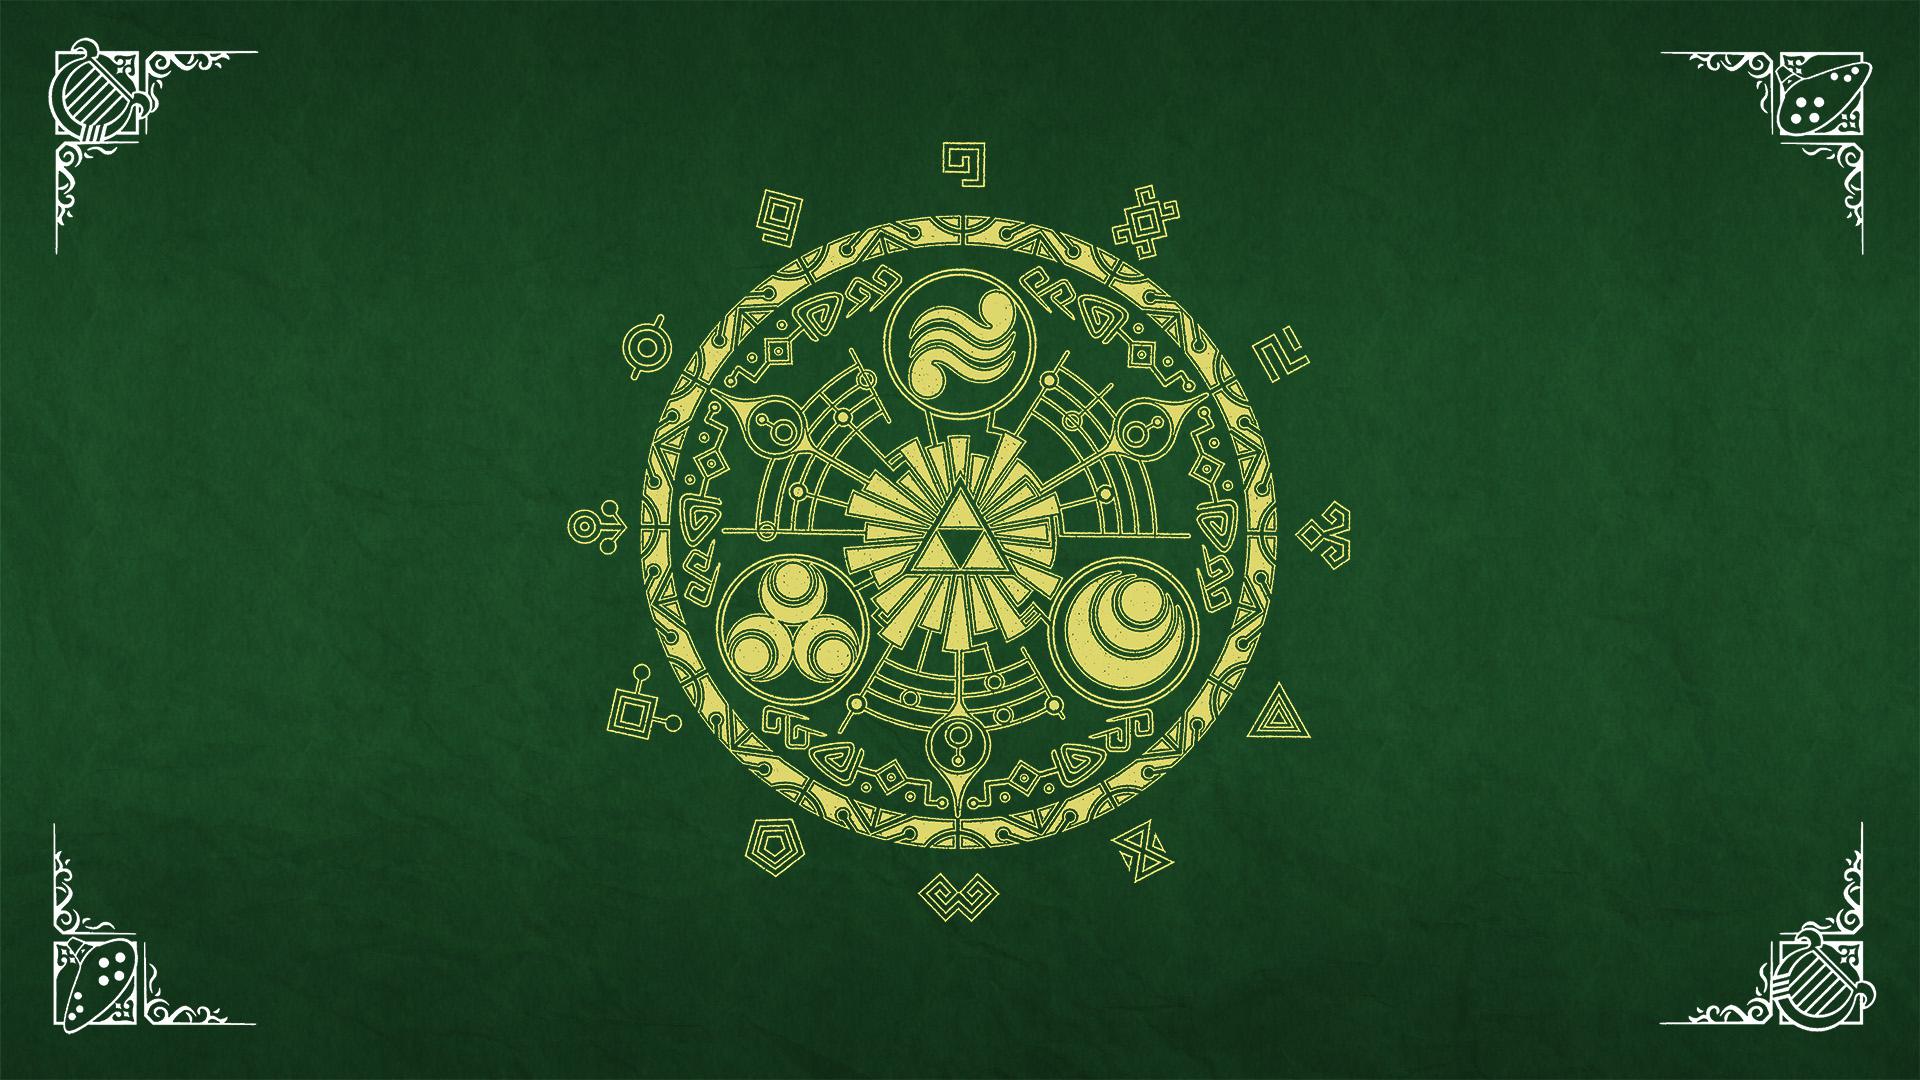 Wallpaper de la Leyenda de Zelda